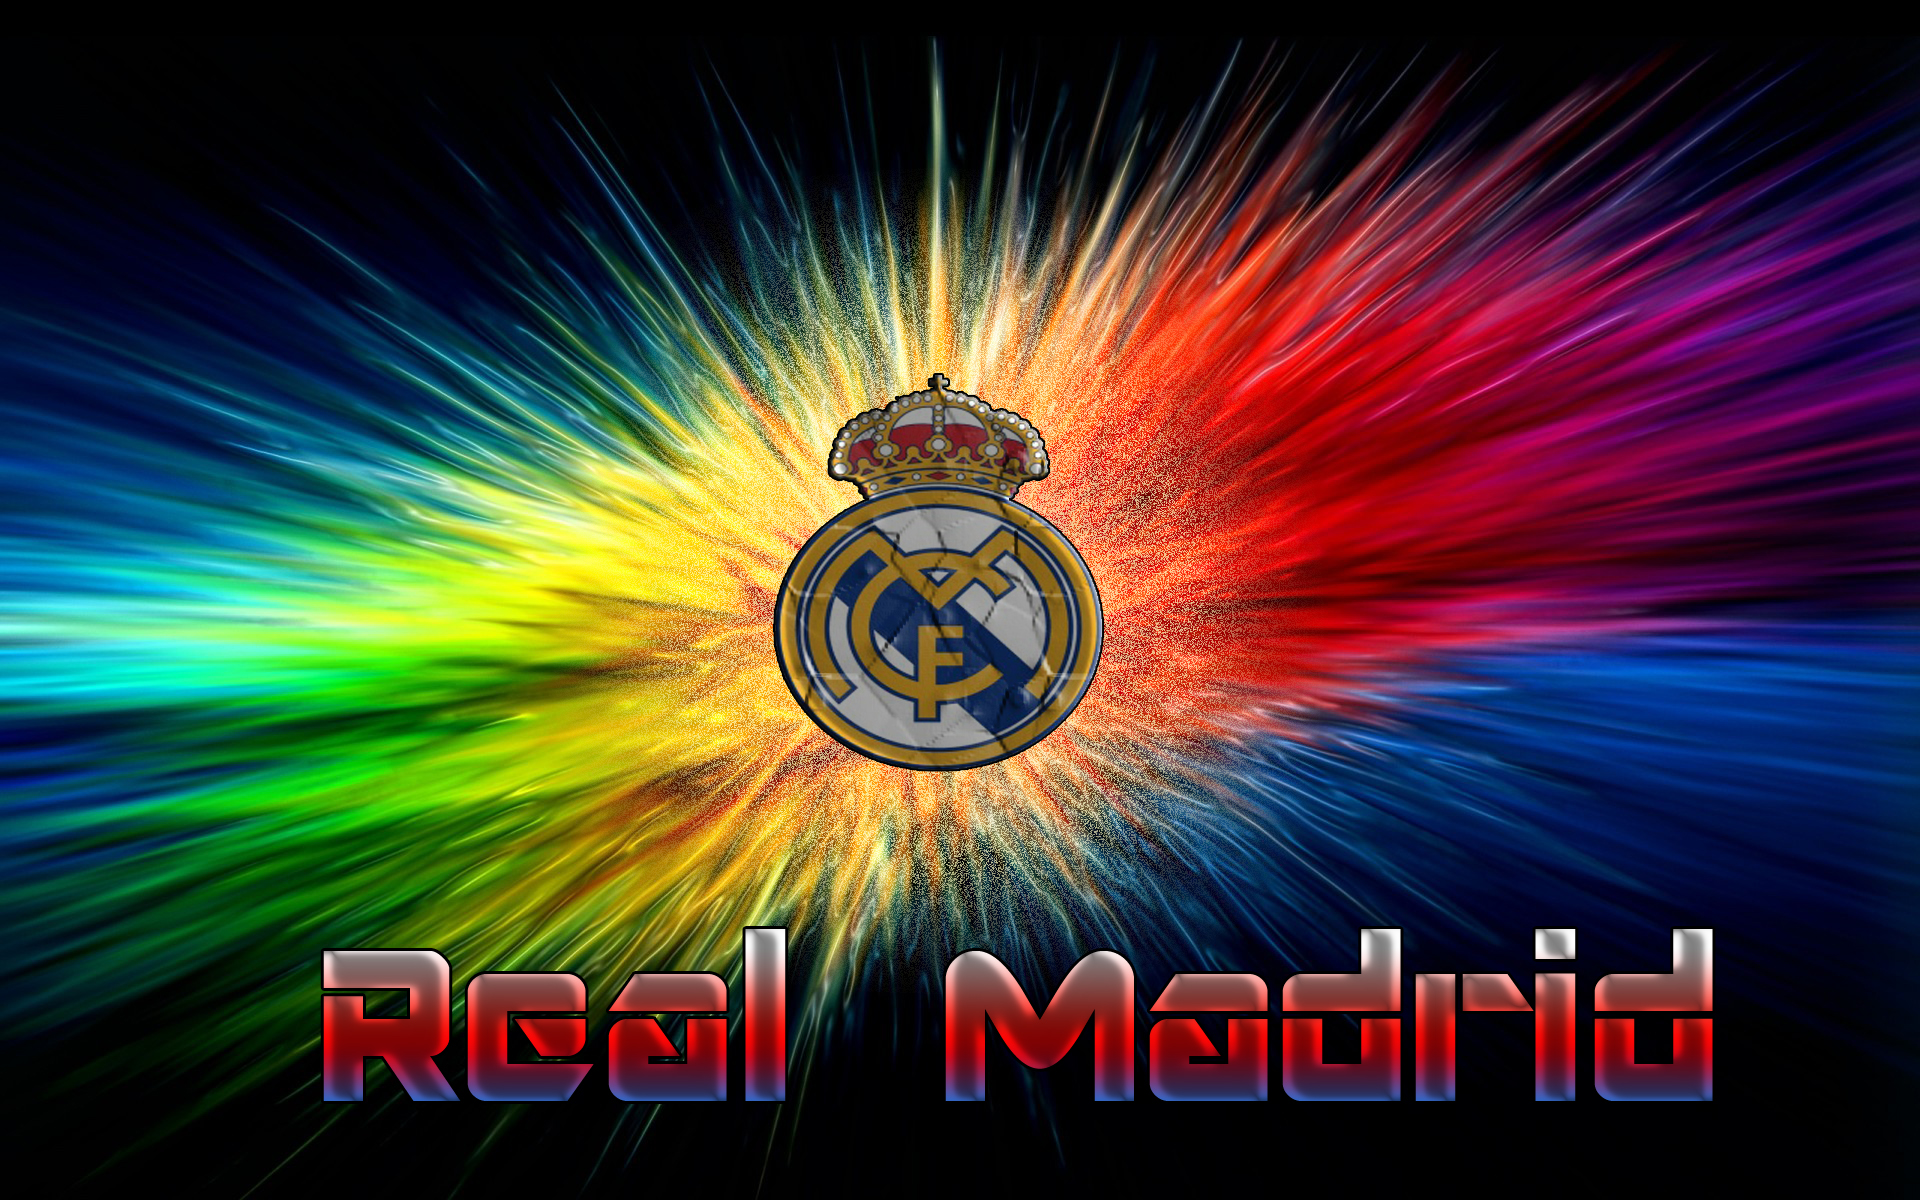 Cool Wallpaper Logo Real Madrid - real_madrid_wallpaper_hd_by_badanonymousremix-d4ya2ux  Graphic_503425.jpg